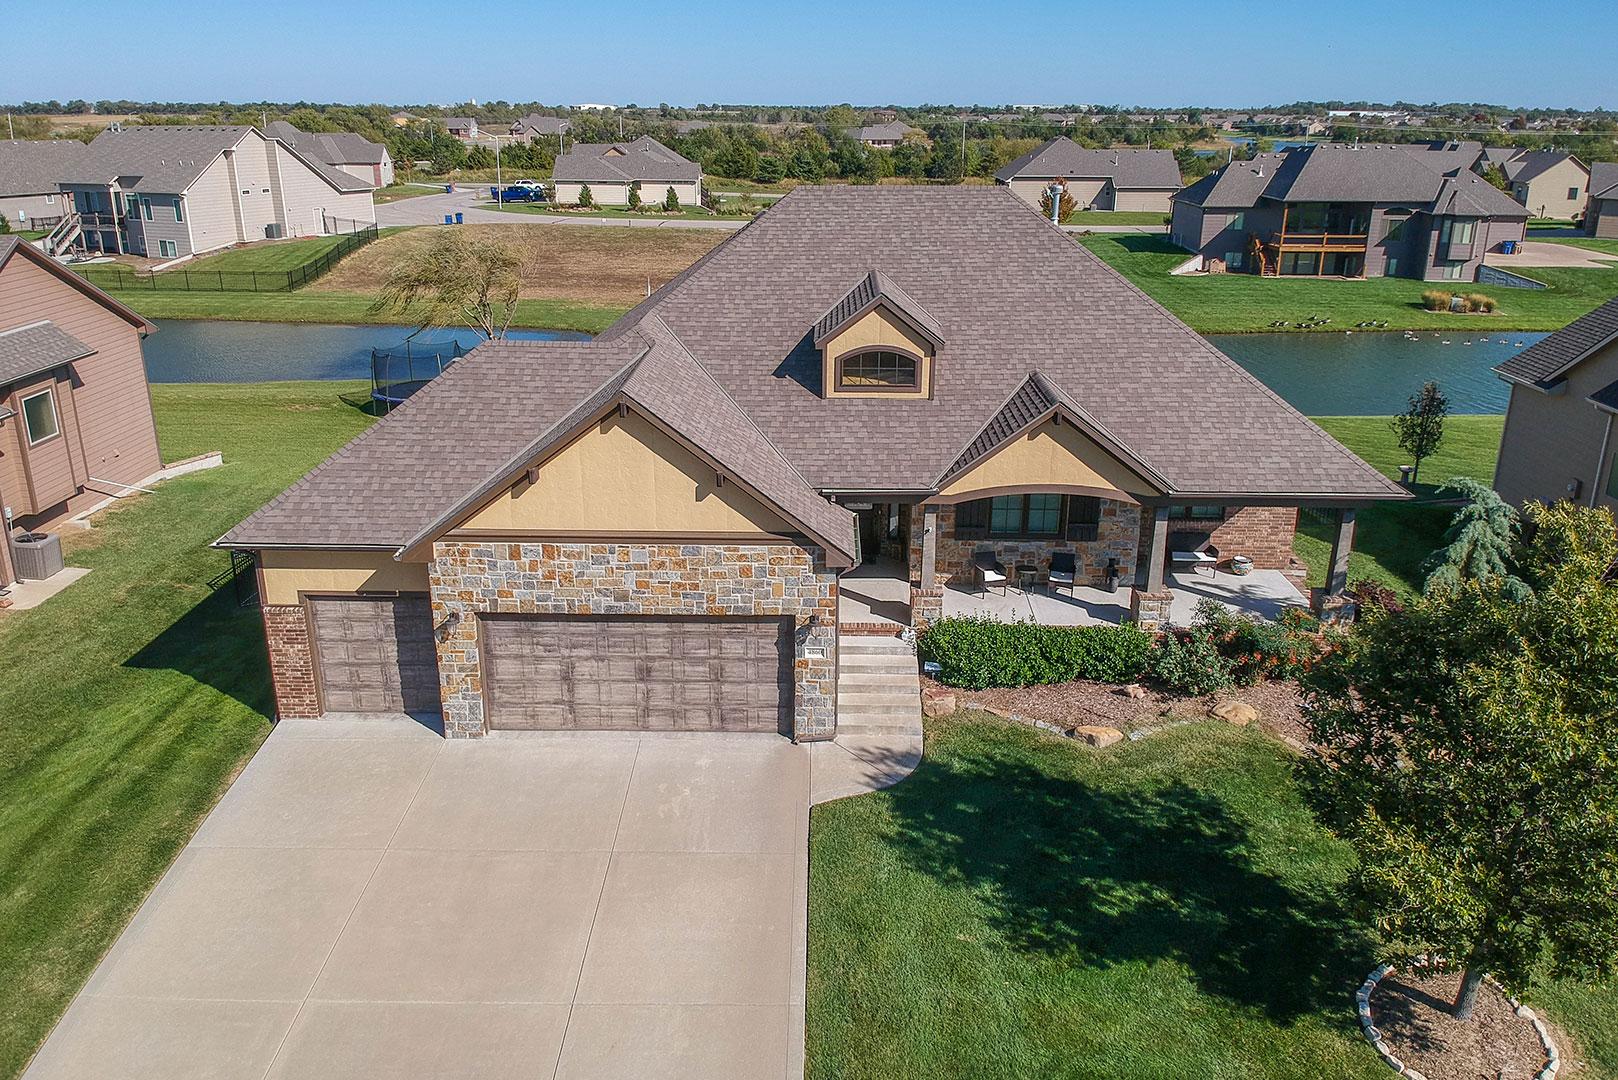 Auction - (Bel Aire) Premier | 5-br, 3-ba Luxury Home In Elk Creek - BEL AIRE, KS